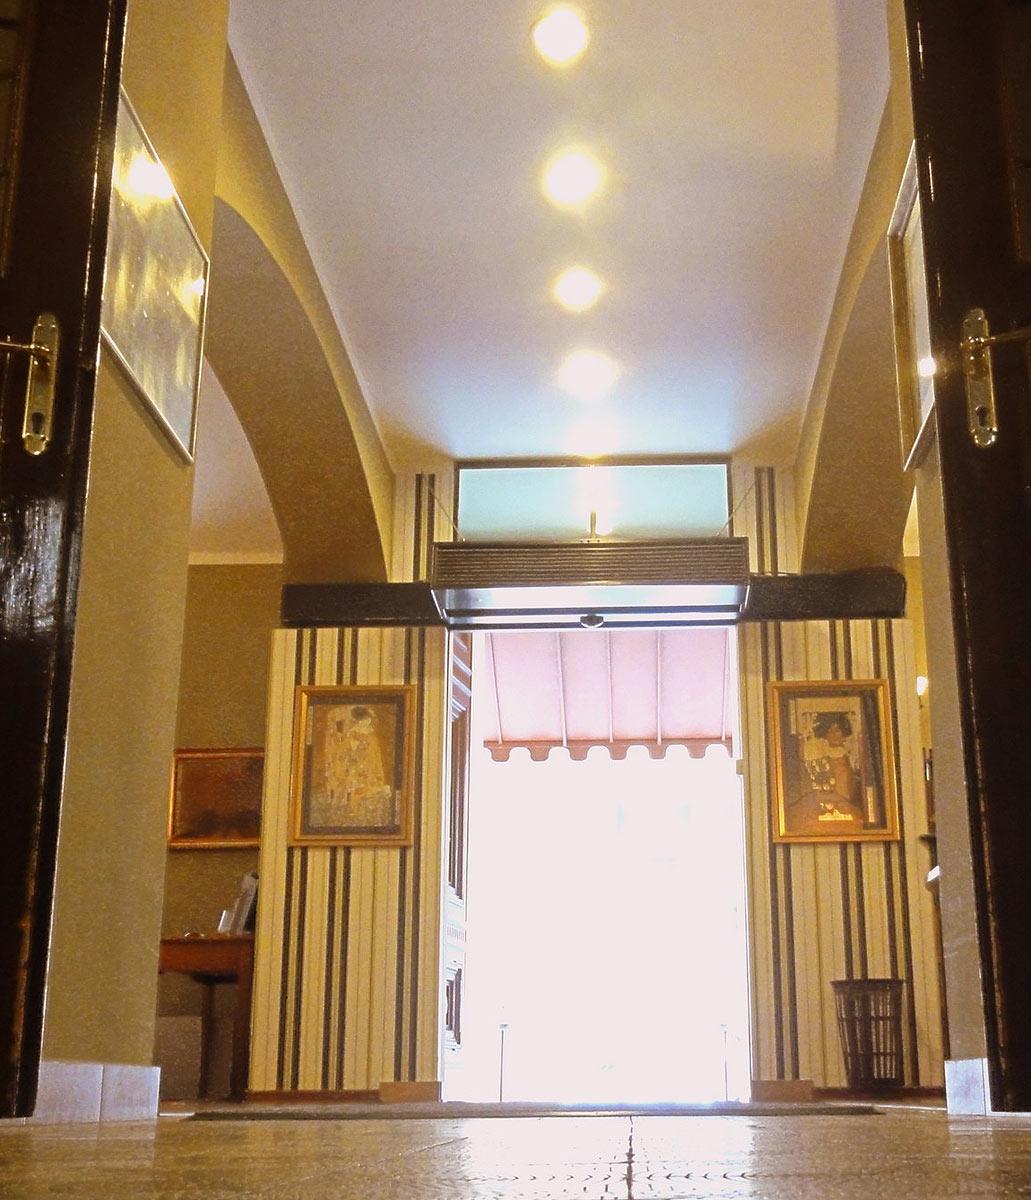 Hotel mal strana obr zky fotky obr zky a fotografie for Hotel residence mala strana tripadvisor